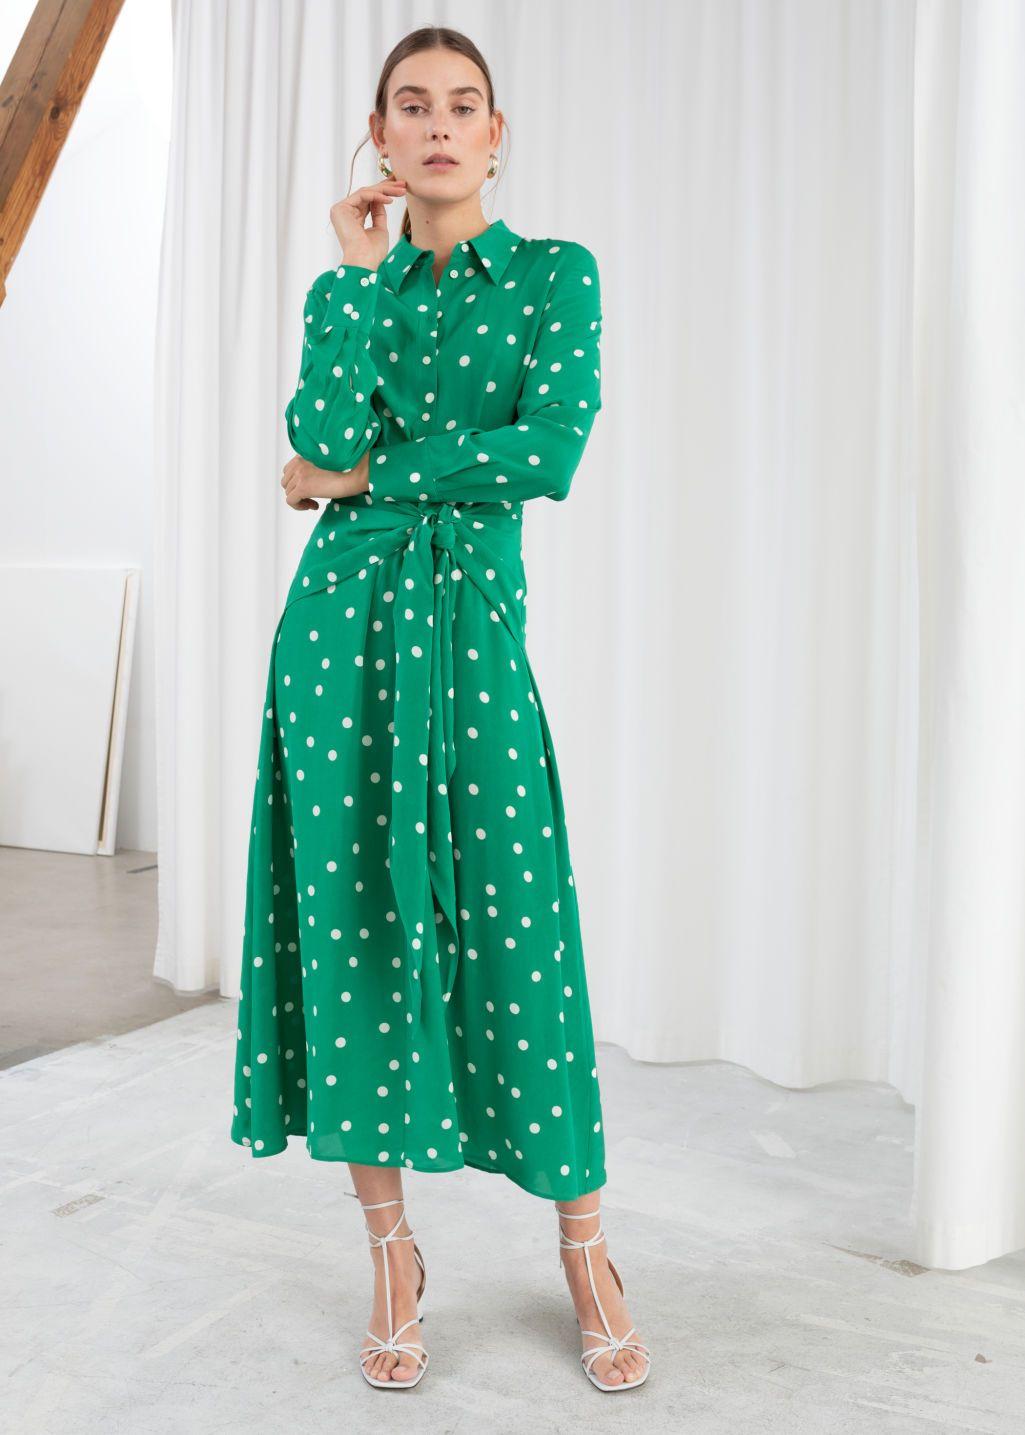 Polka Dot Waist Tie Midi Dress Polka Dot Printed dresses